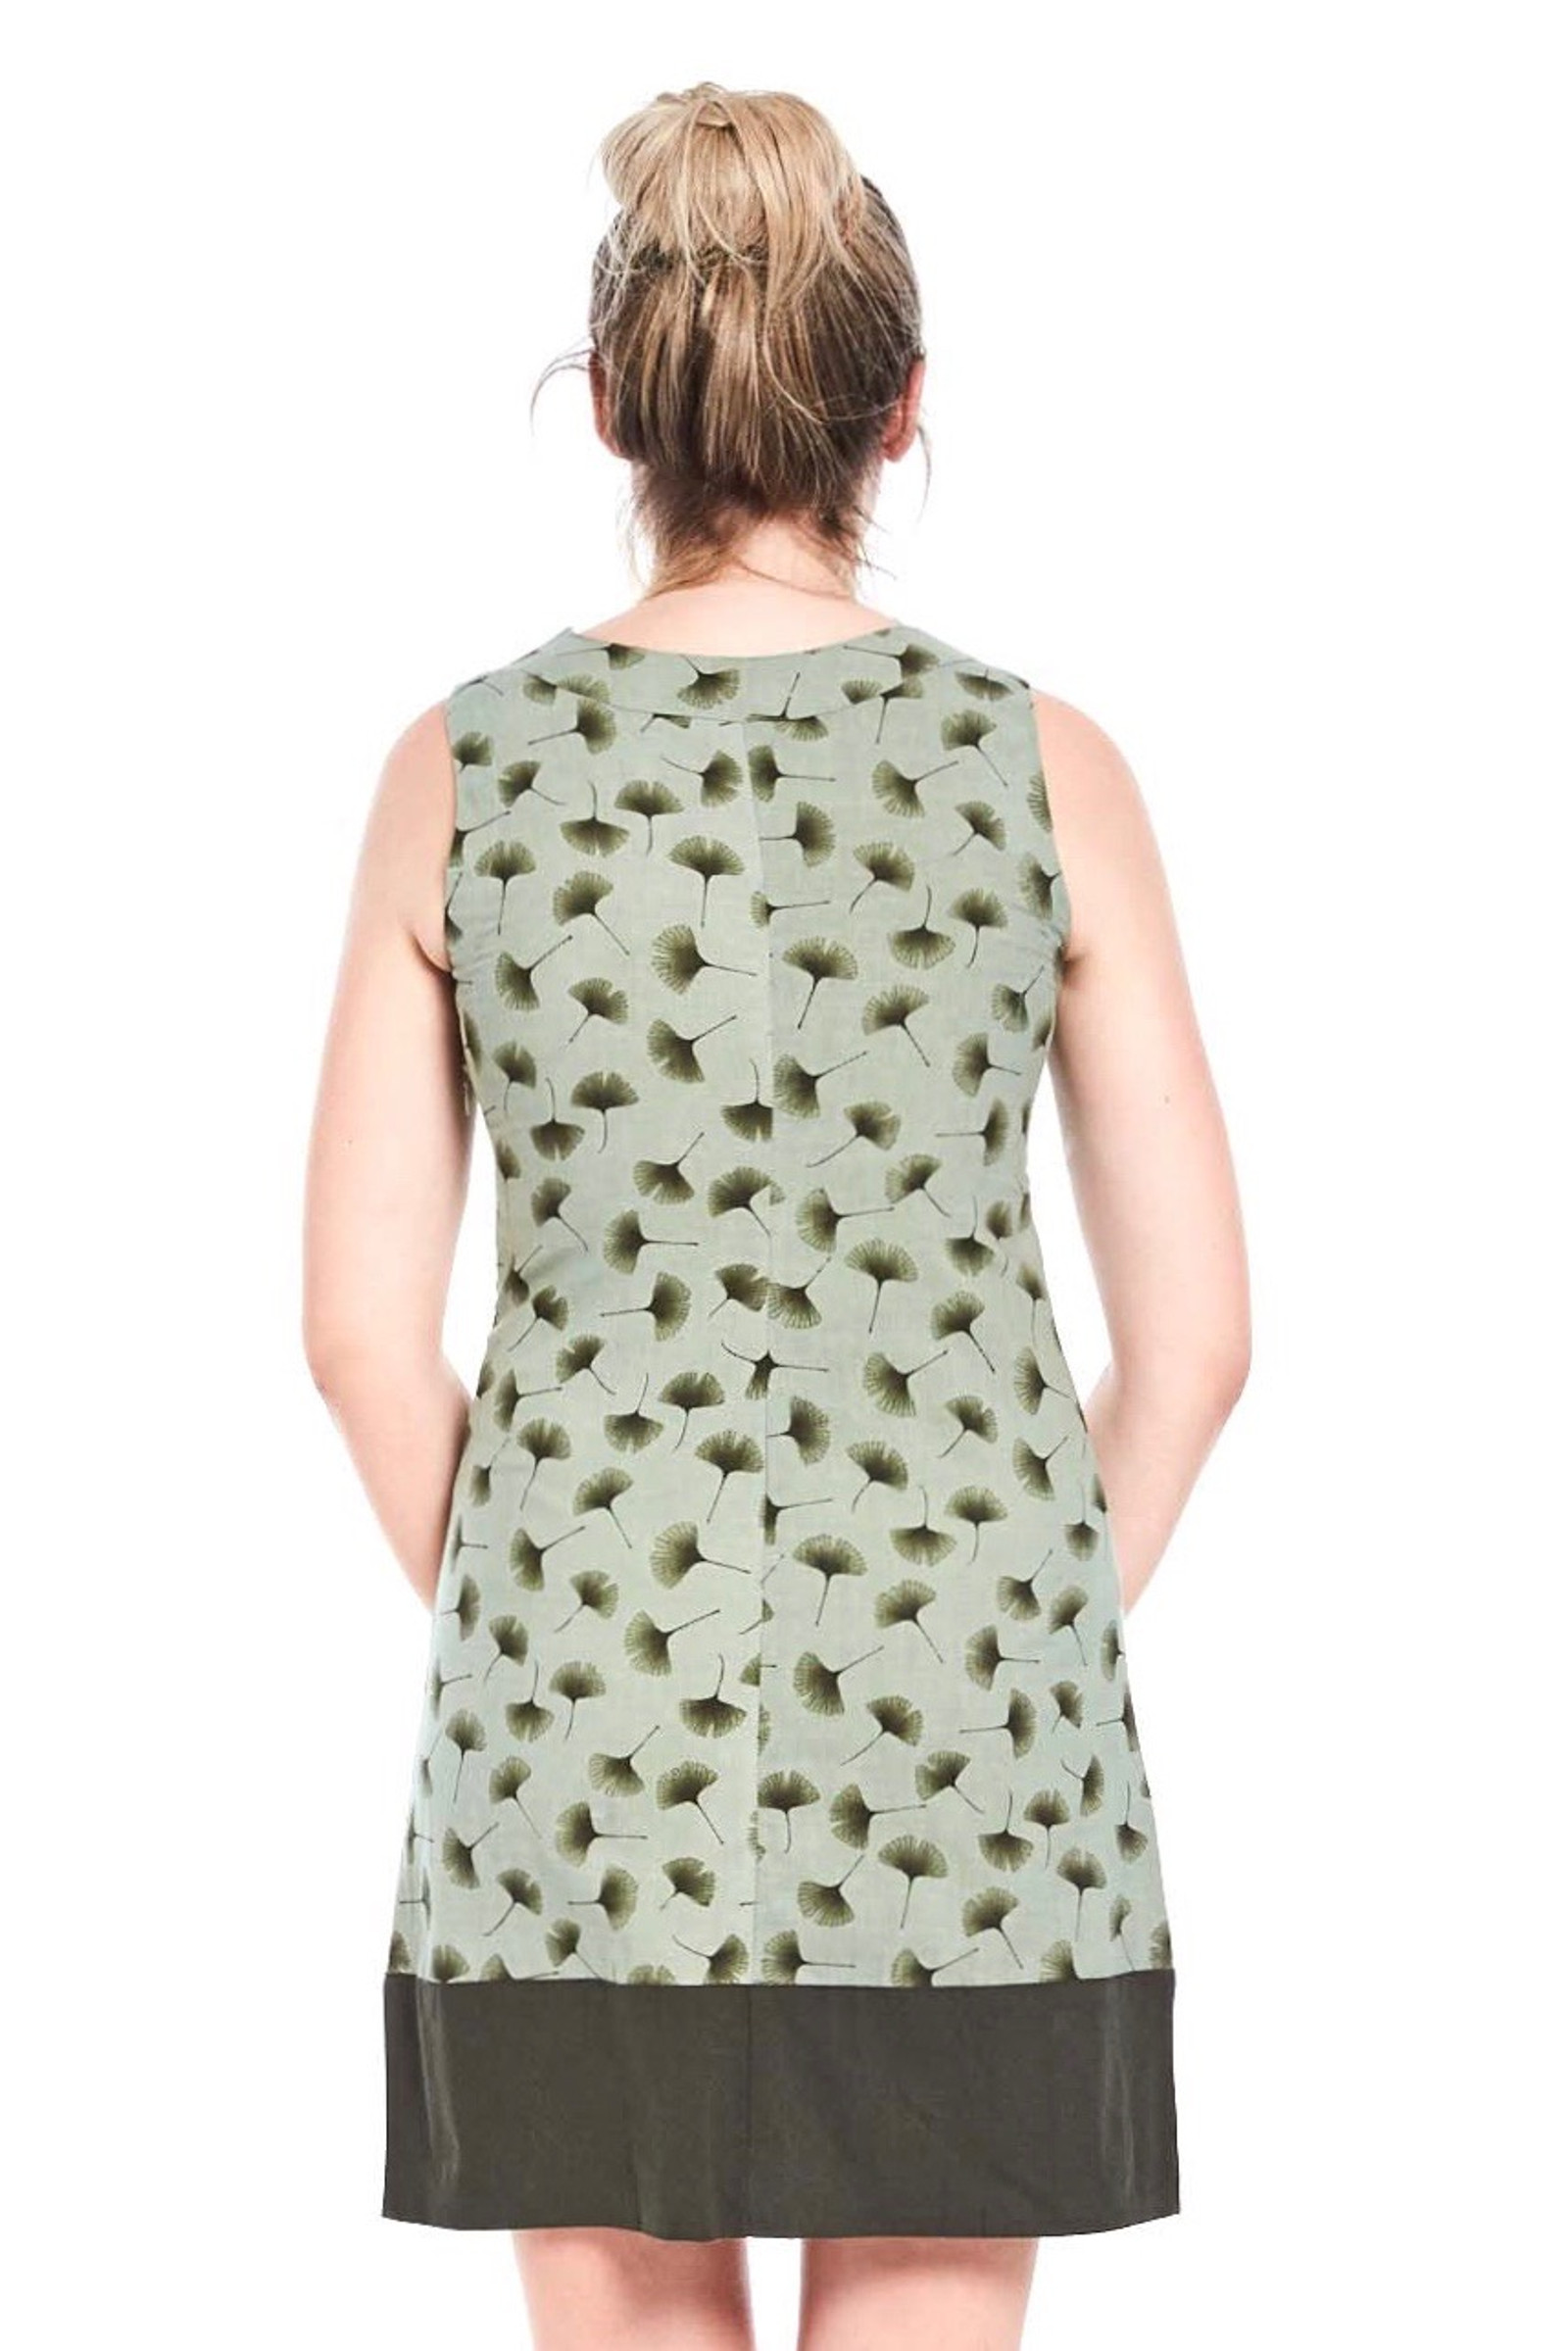 Sixties Tunic - Ginkgo Green